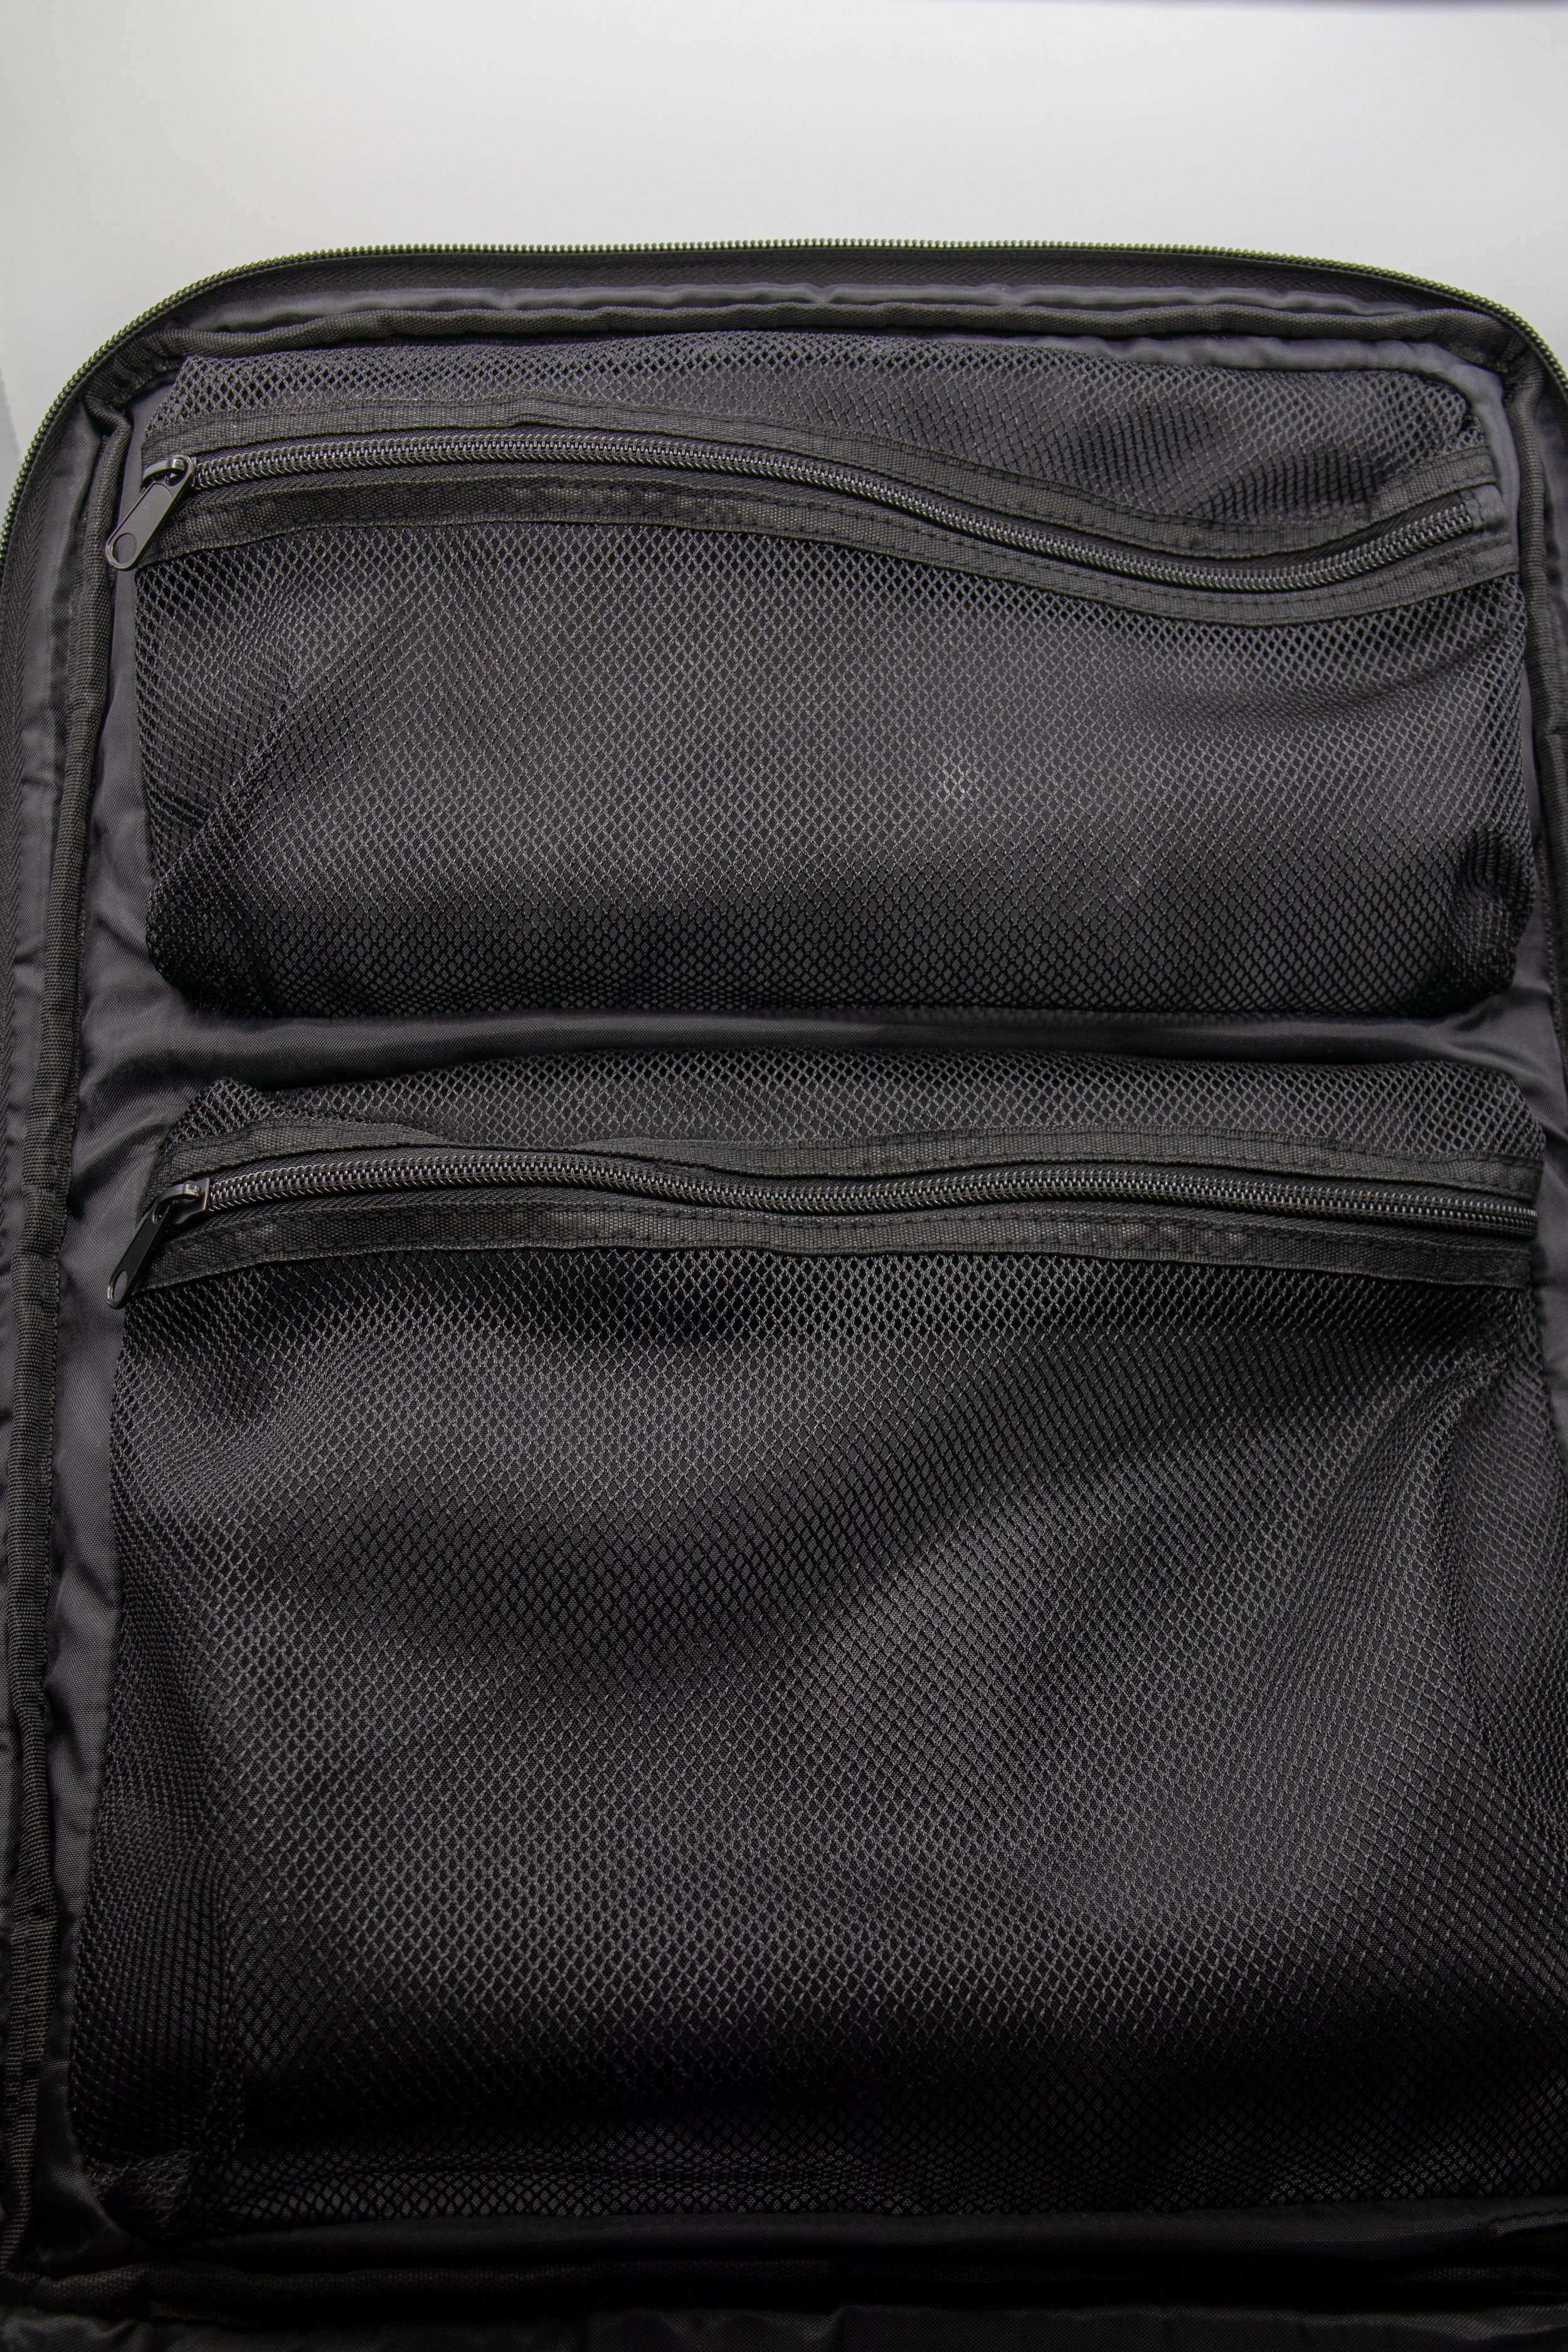 Internal Mesh Pockets -